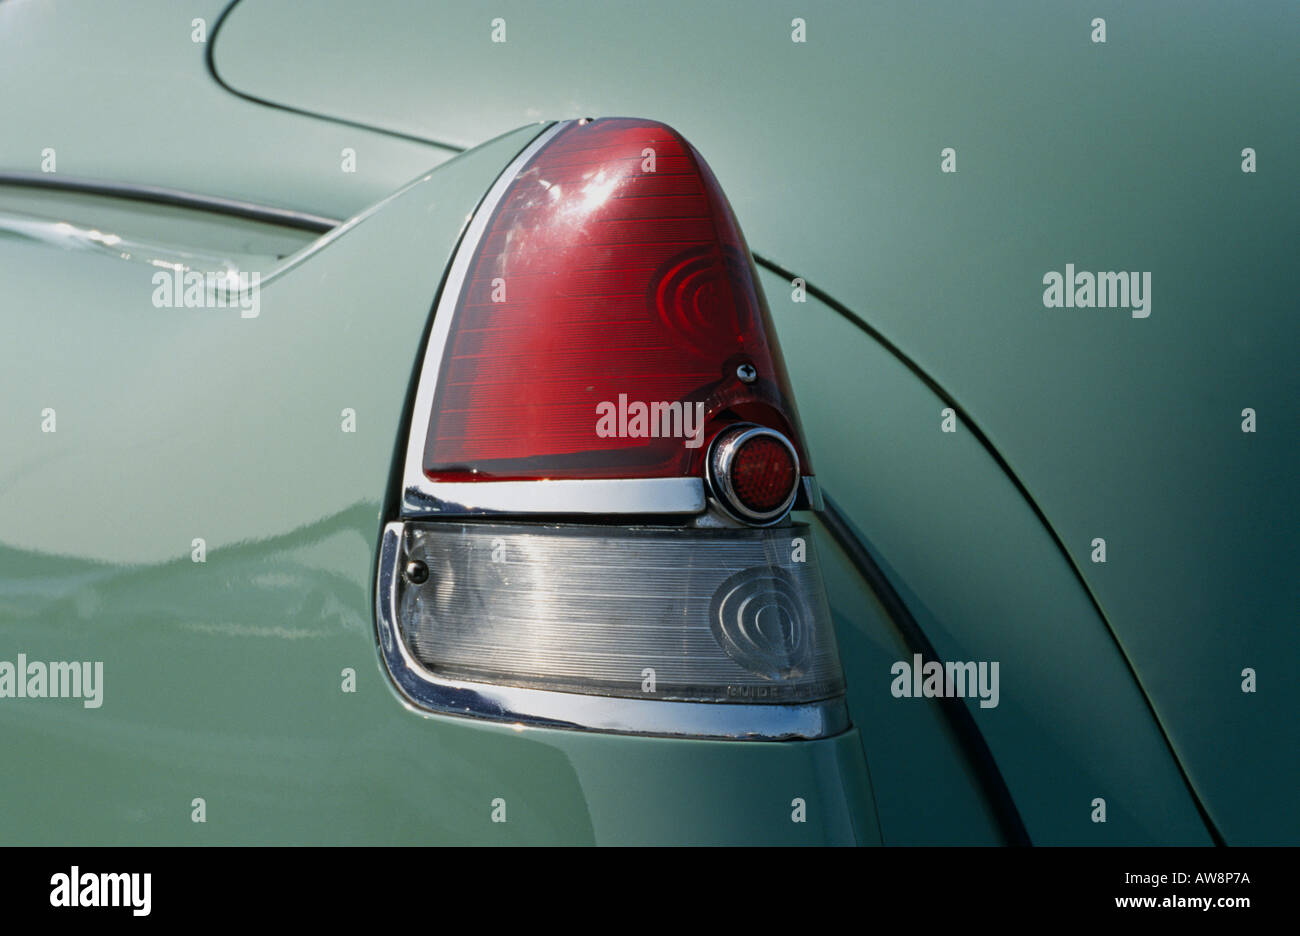 Images Cadillac Series 62 Stock Photos 1951 Sedan Of Image